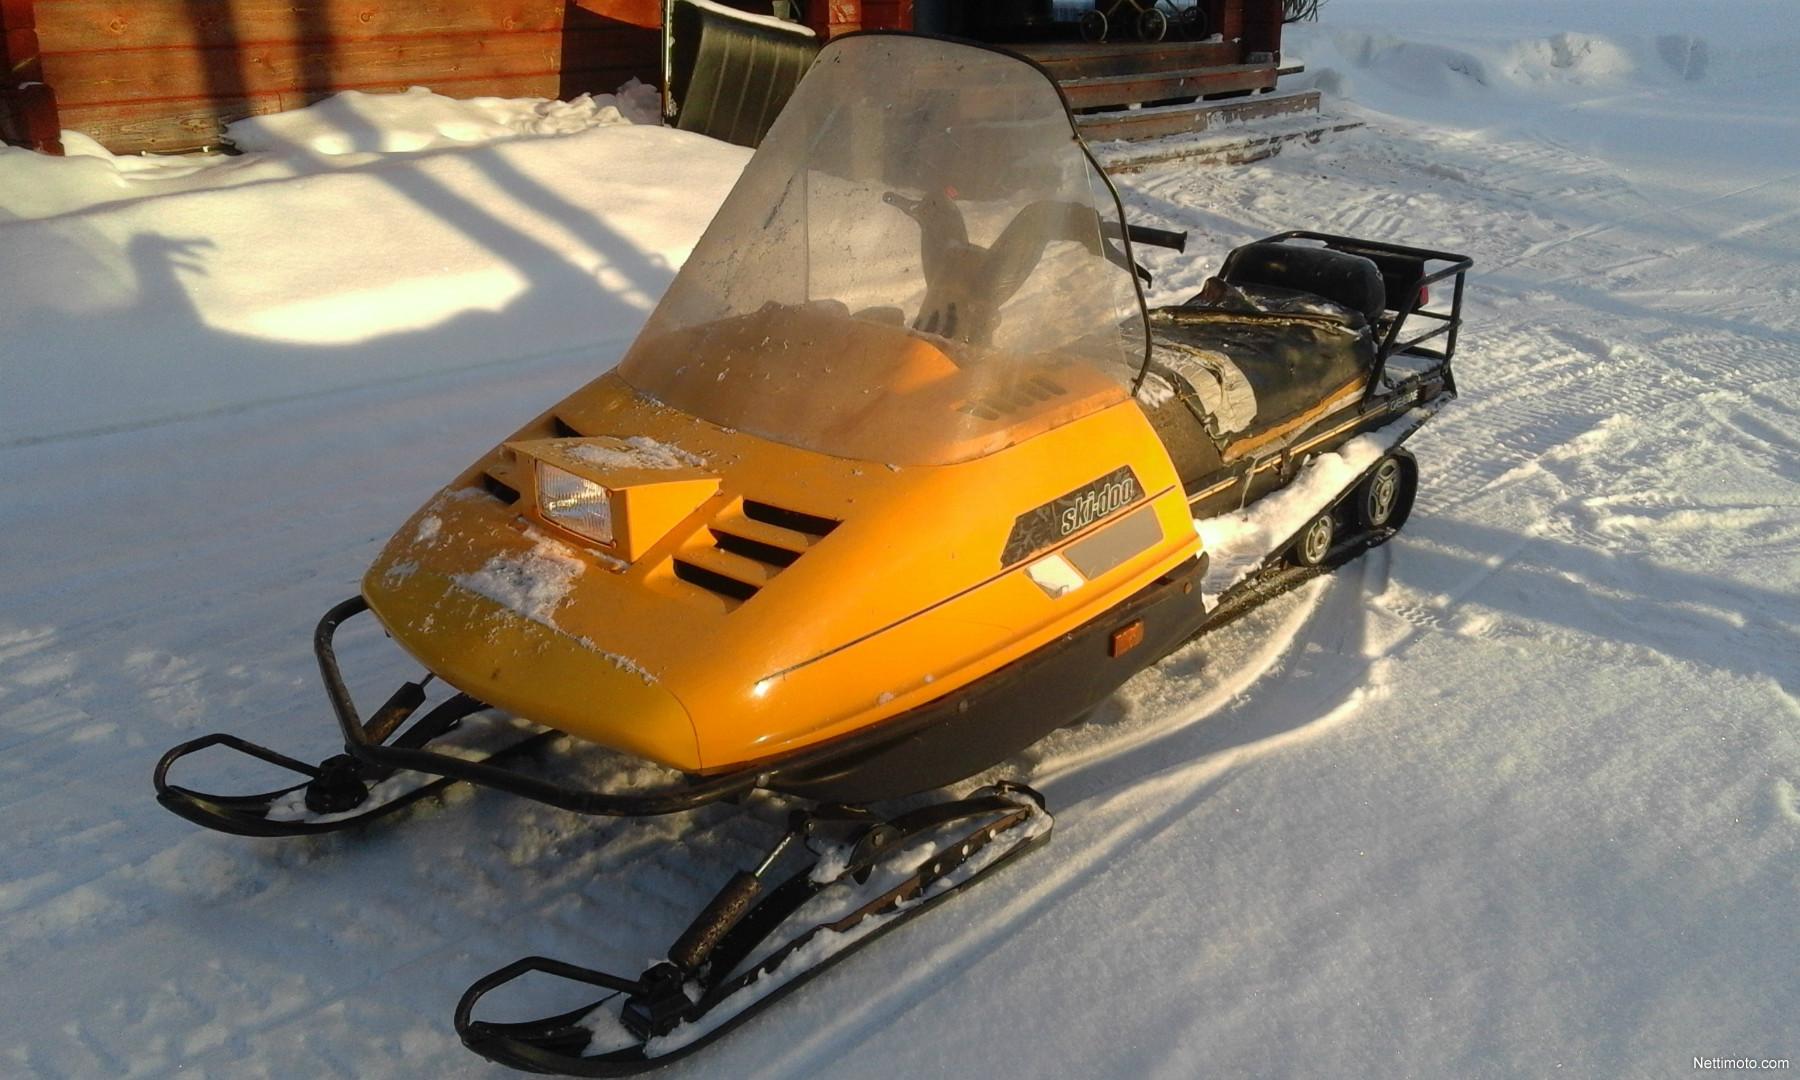 Yellow Ski Doo >> Ski-Doo Safari cheynne 500 cm³ 1990 - Ii - Snow Mobile - Nettimoto